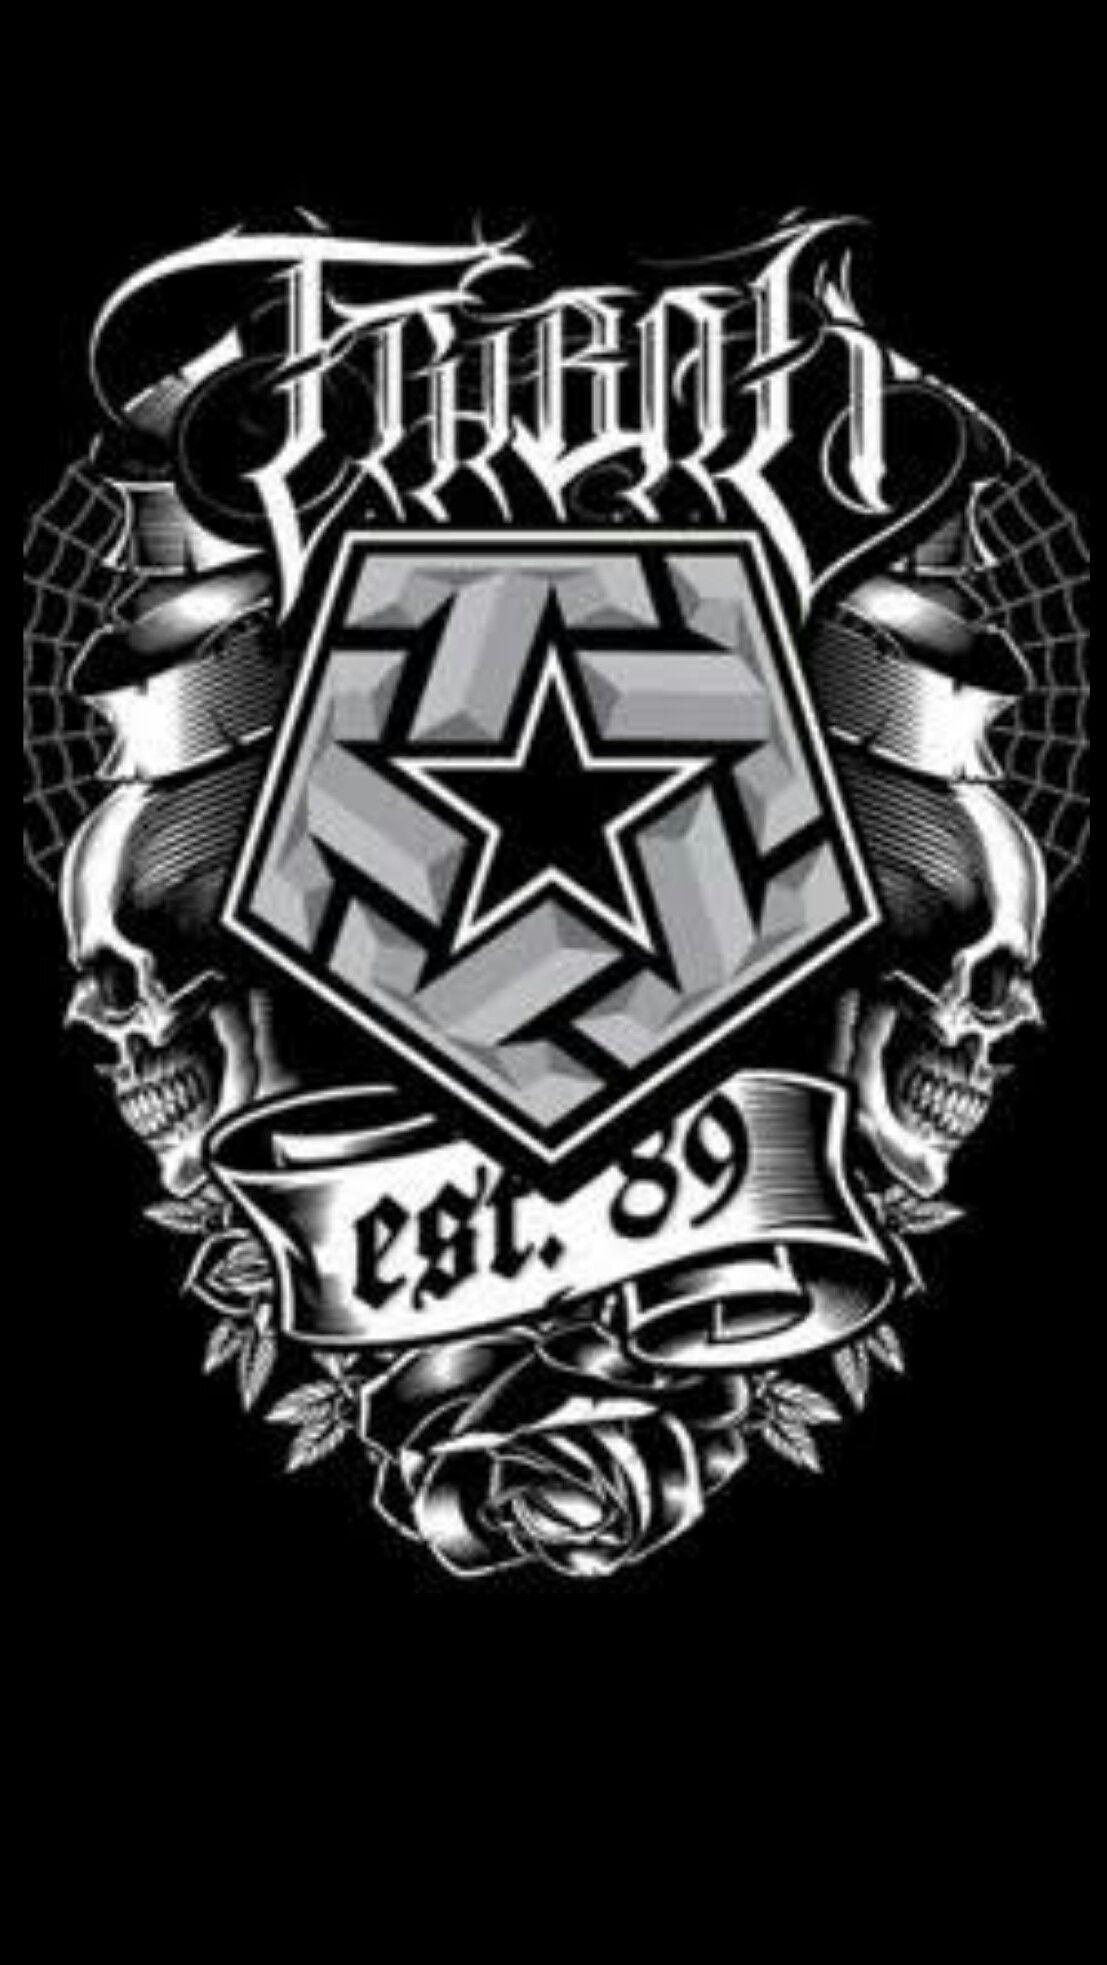 Tribal Black Wallpaper Android Iphone Tribal Gear Tribal Skull Tribal Wallpaper Wallpaper hd tribal tattoo